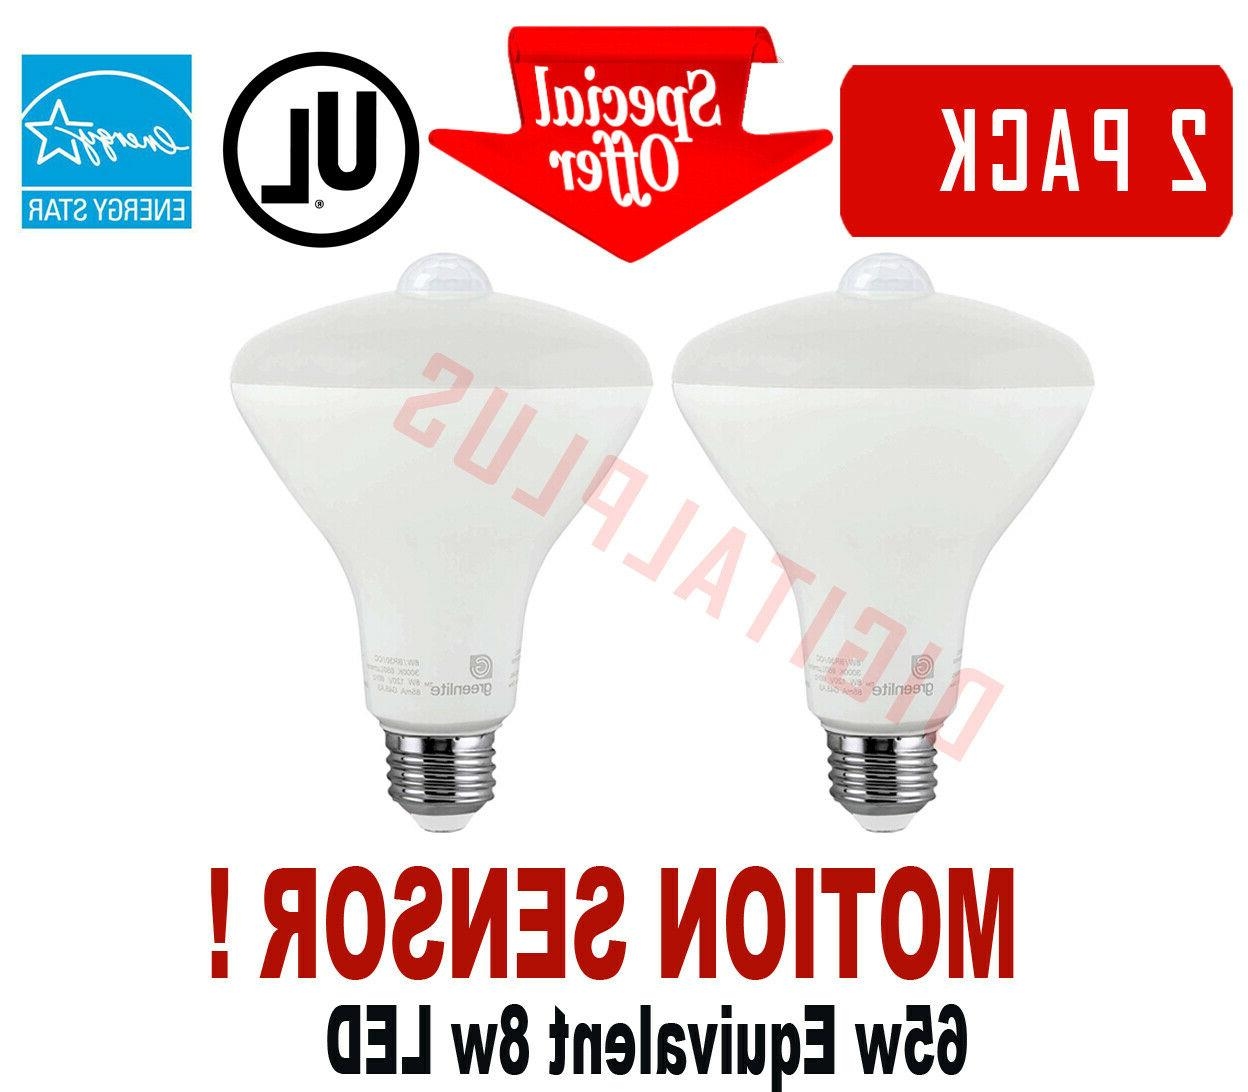 2 LED Sensor BR30 Equivalent 650L